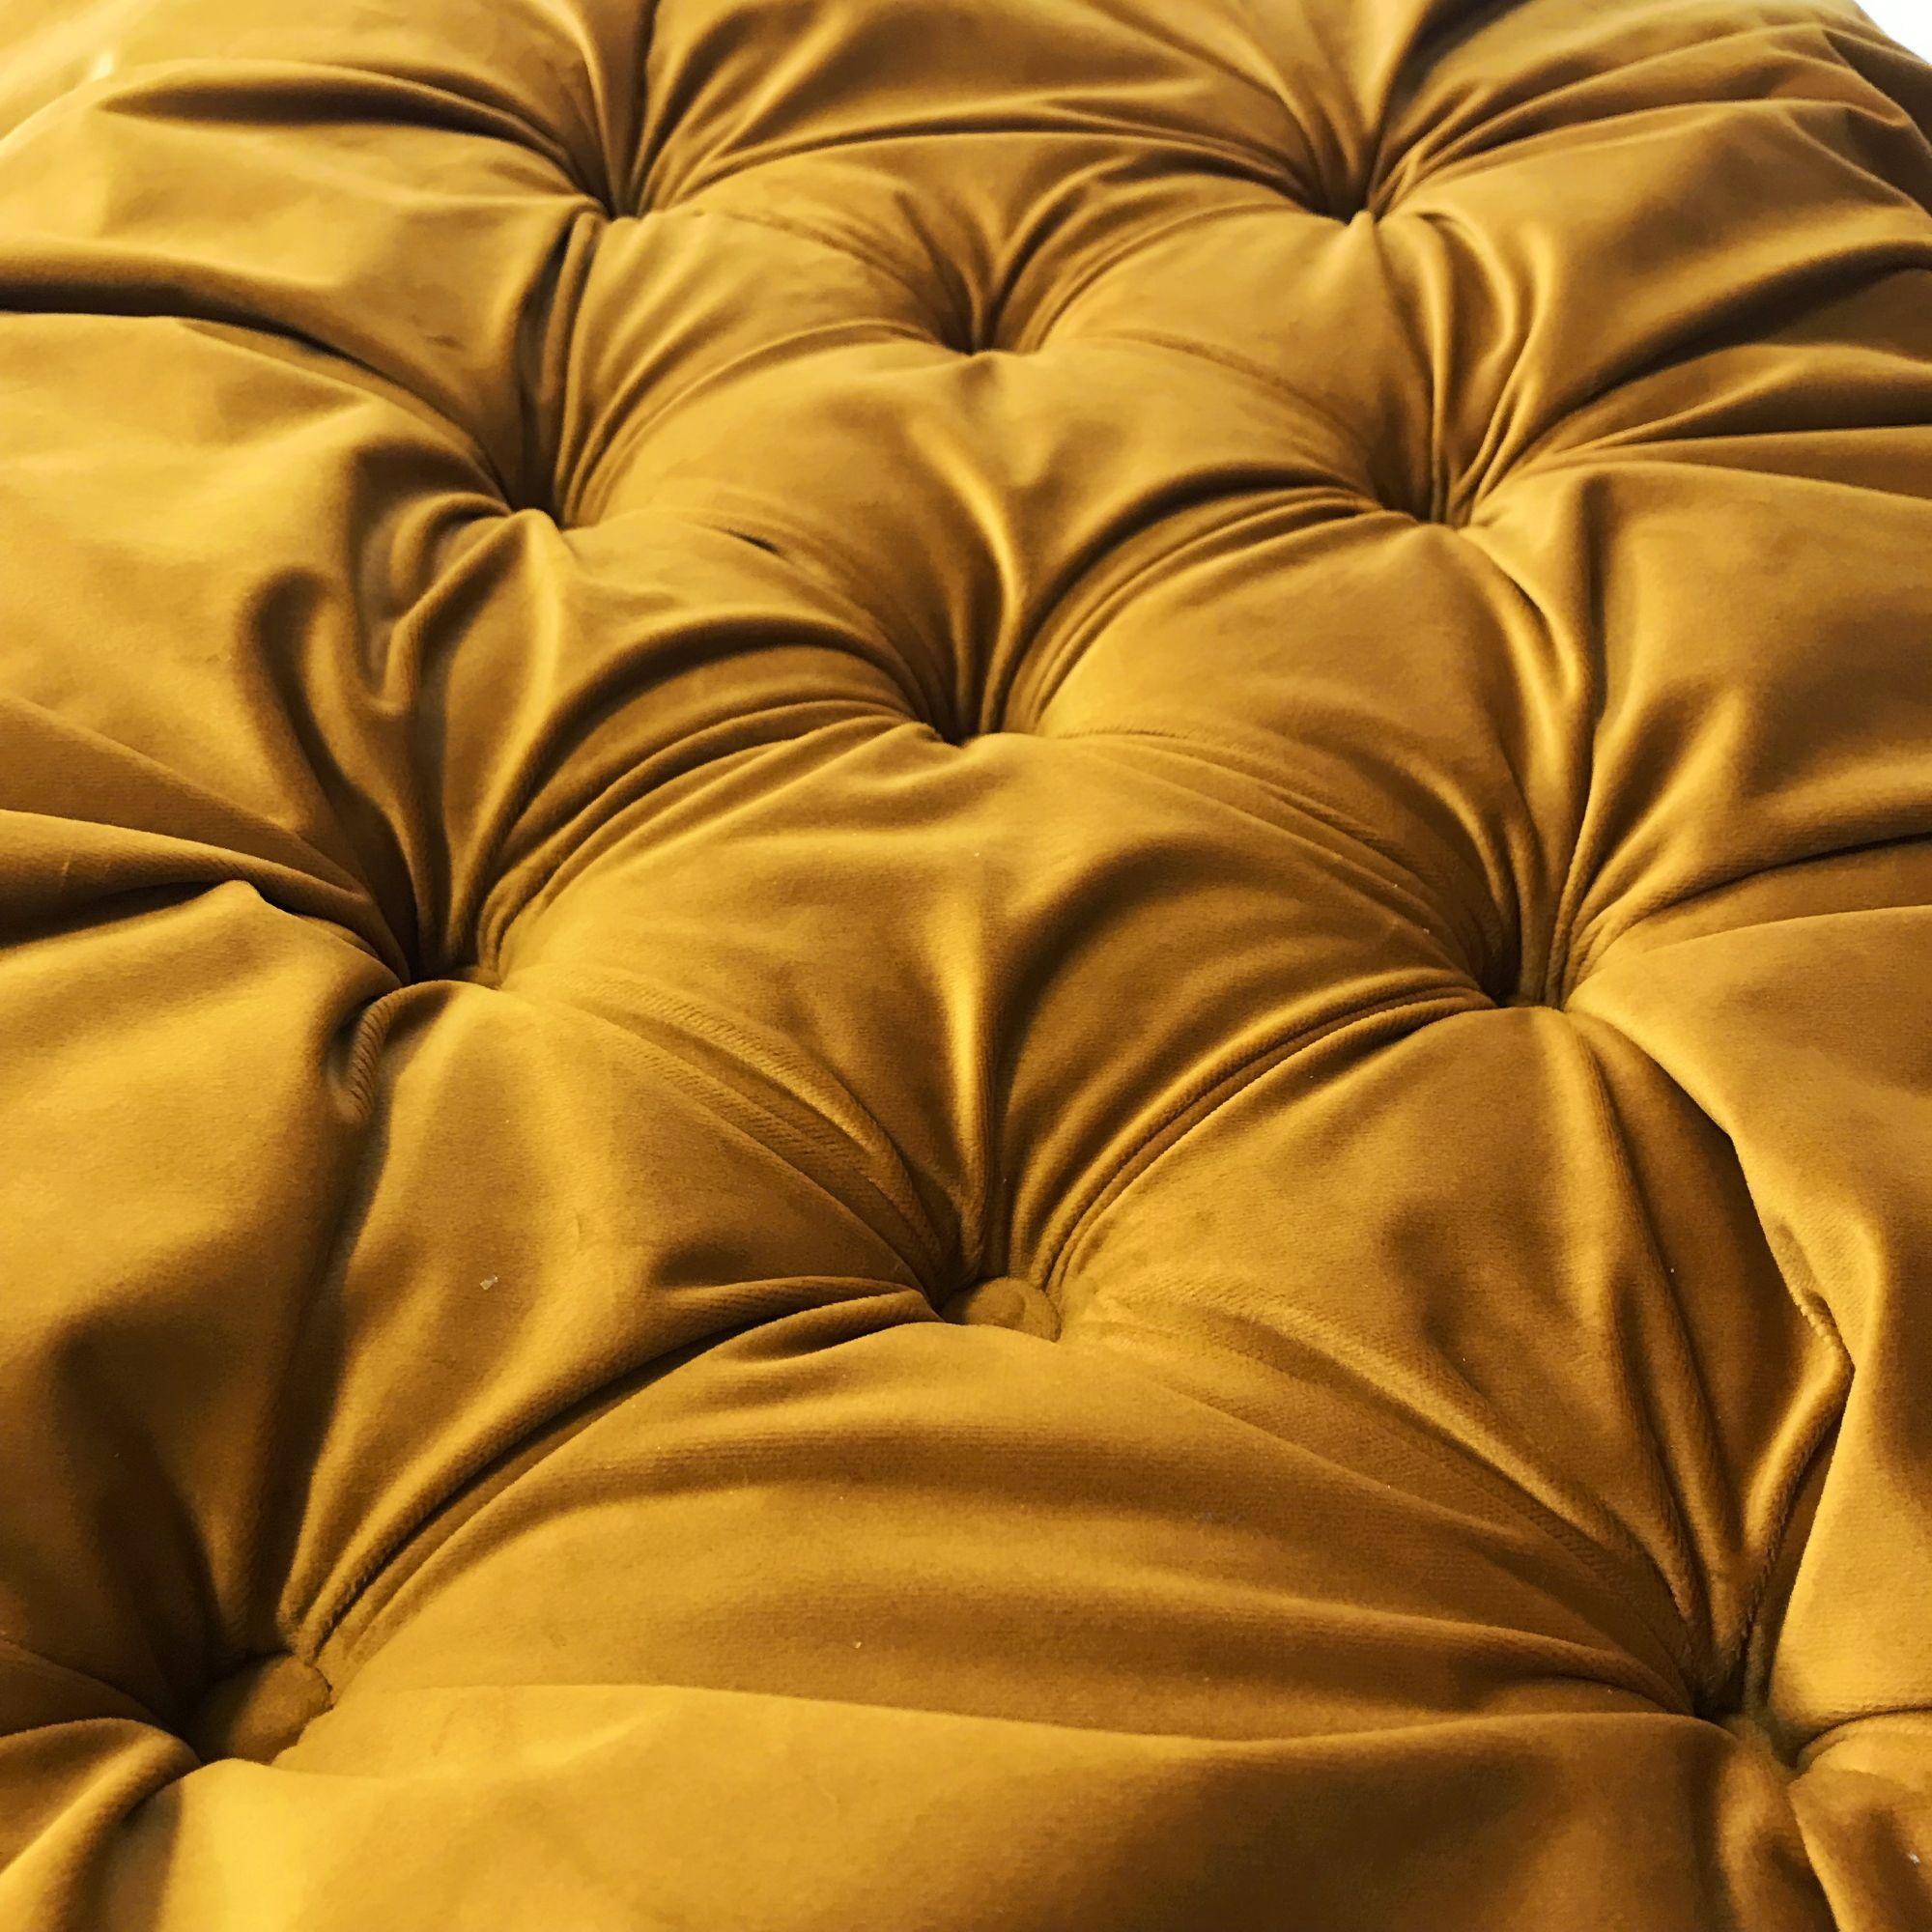 Beautiful Ochre Mustard Turmeric Velvet Fabric With Its